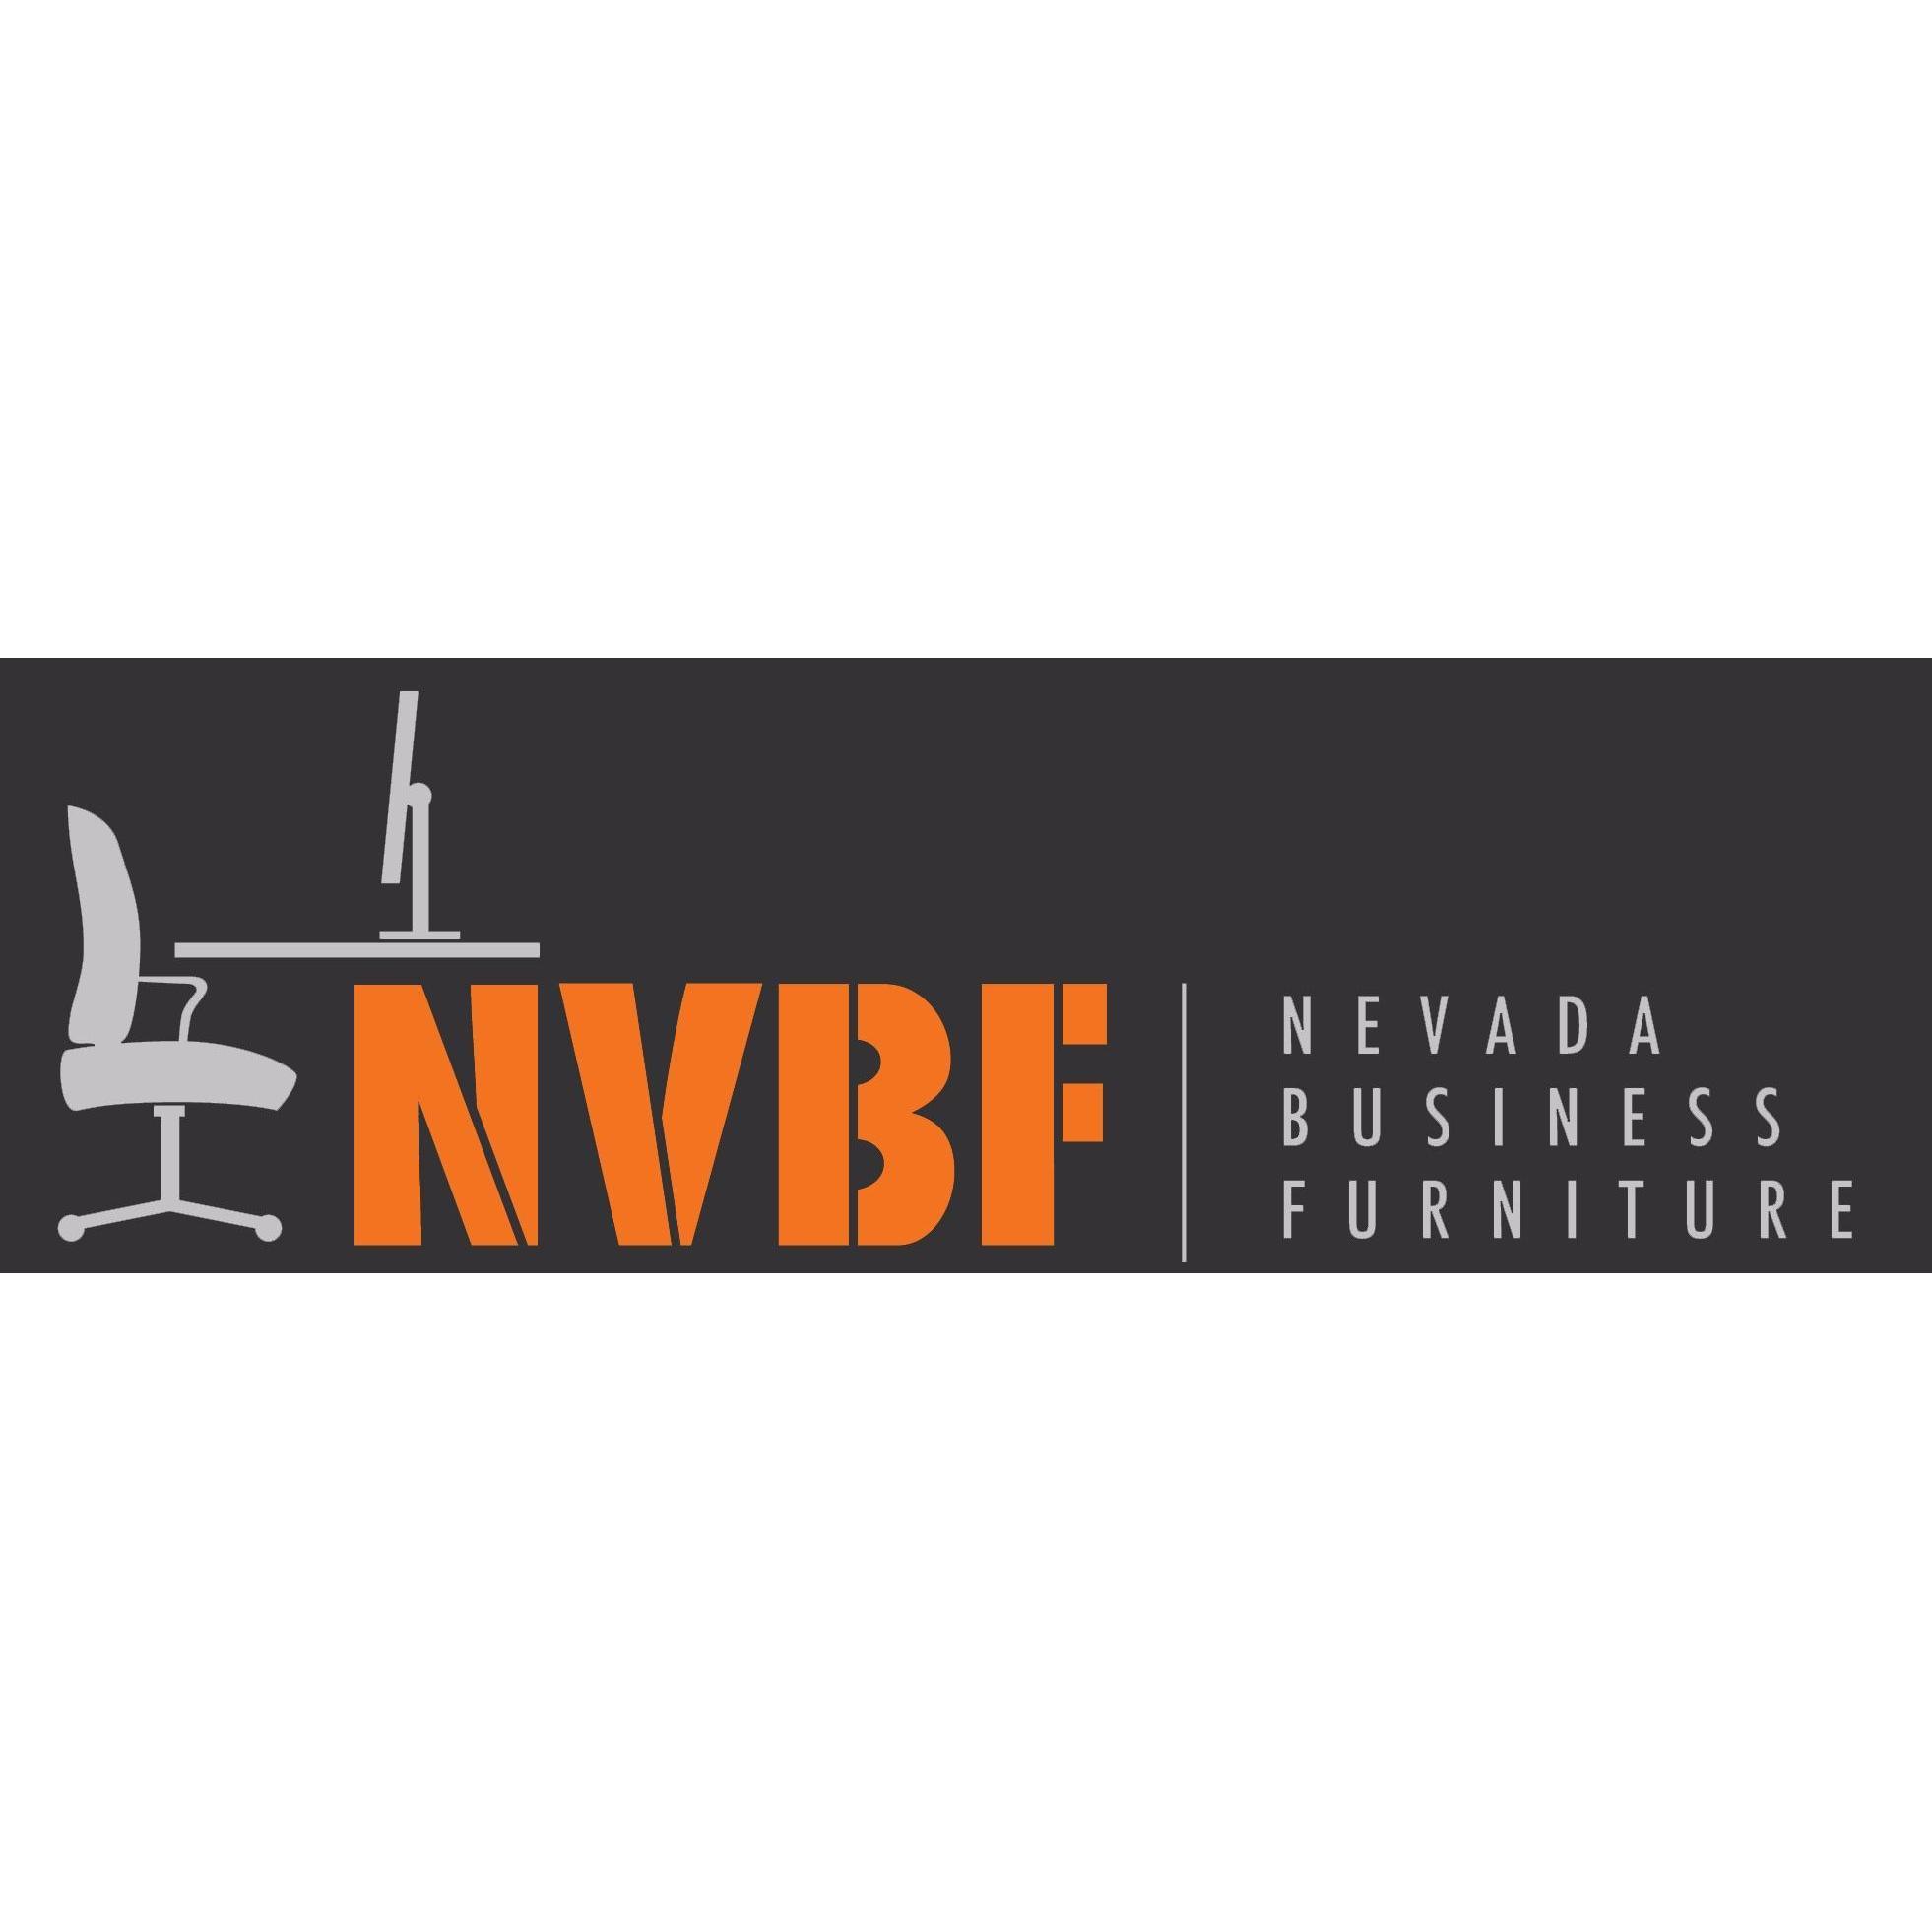 Nevada Business Furniture In Las Vegas Nv 89102